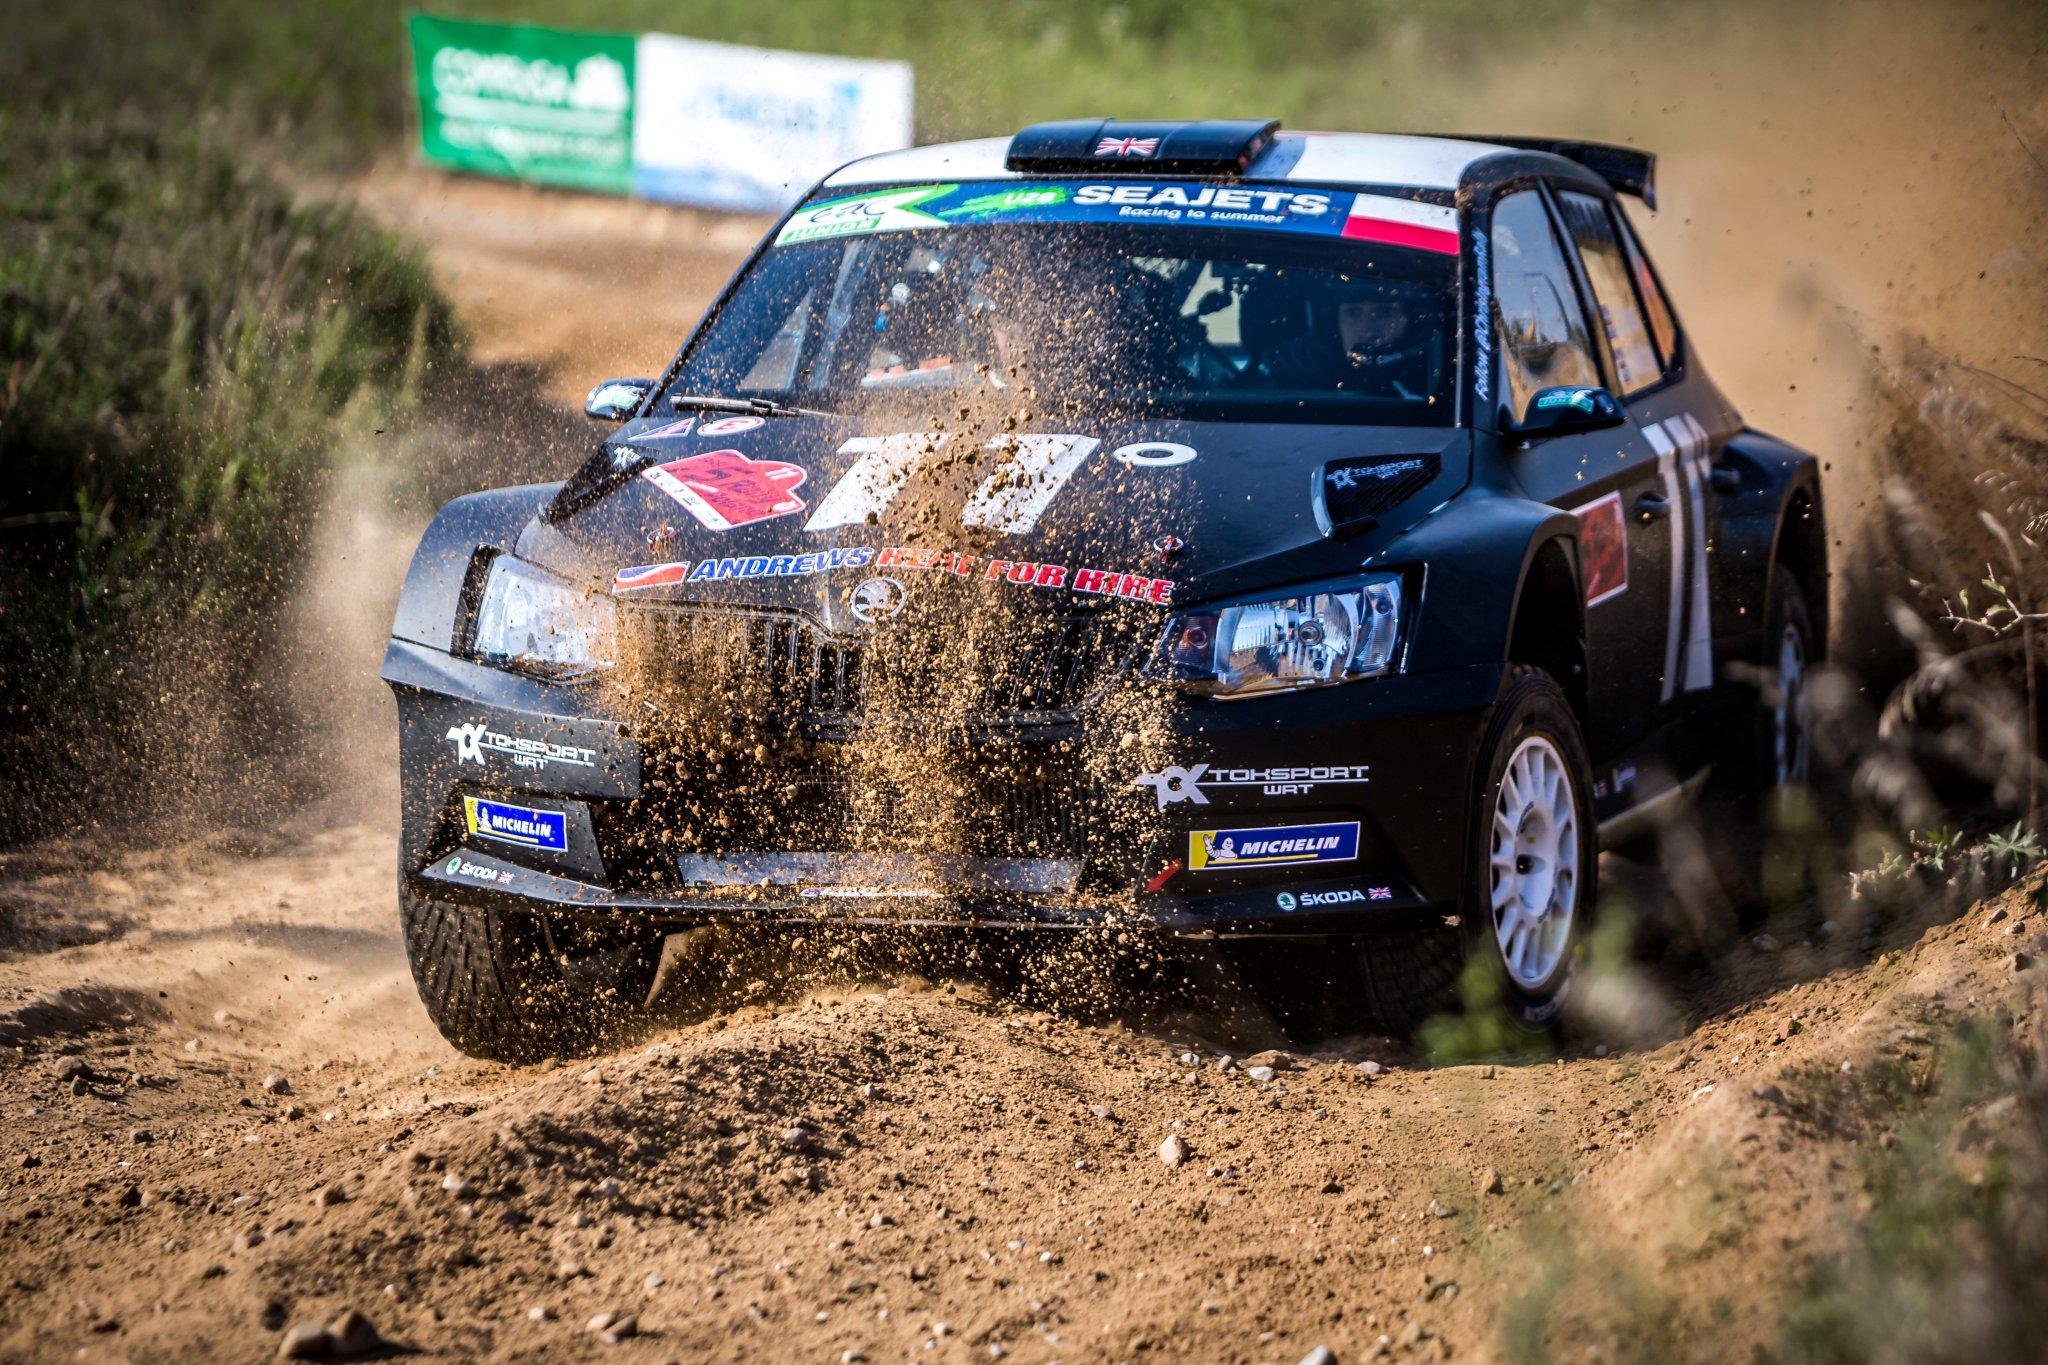 Rally Polonia 2018 ERC - Página 3 Dnyf926W0AA8TW9